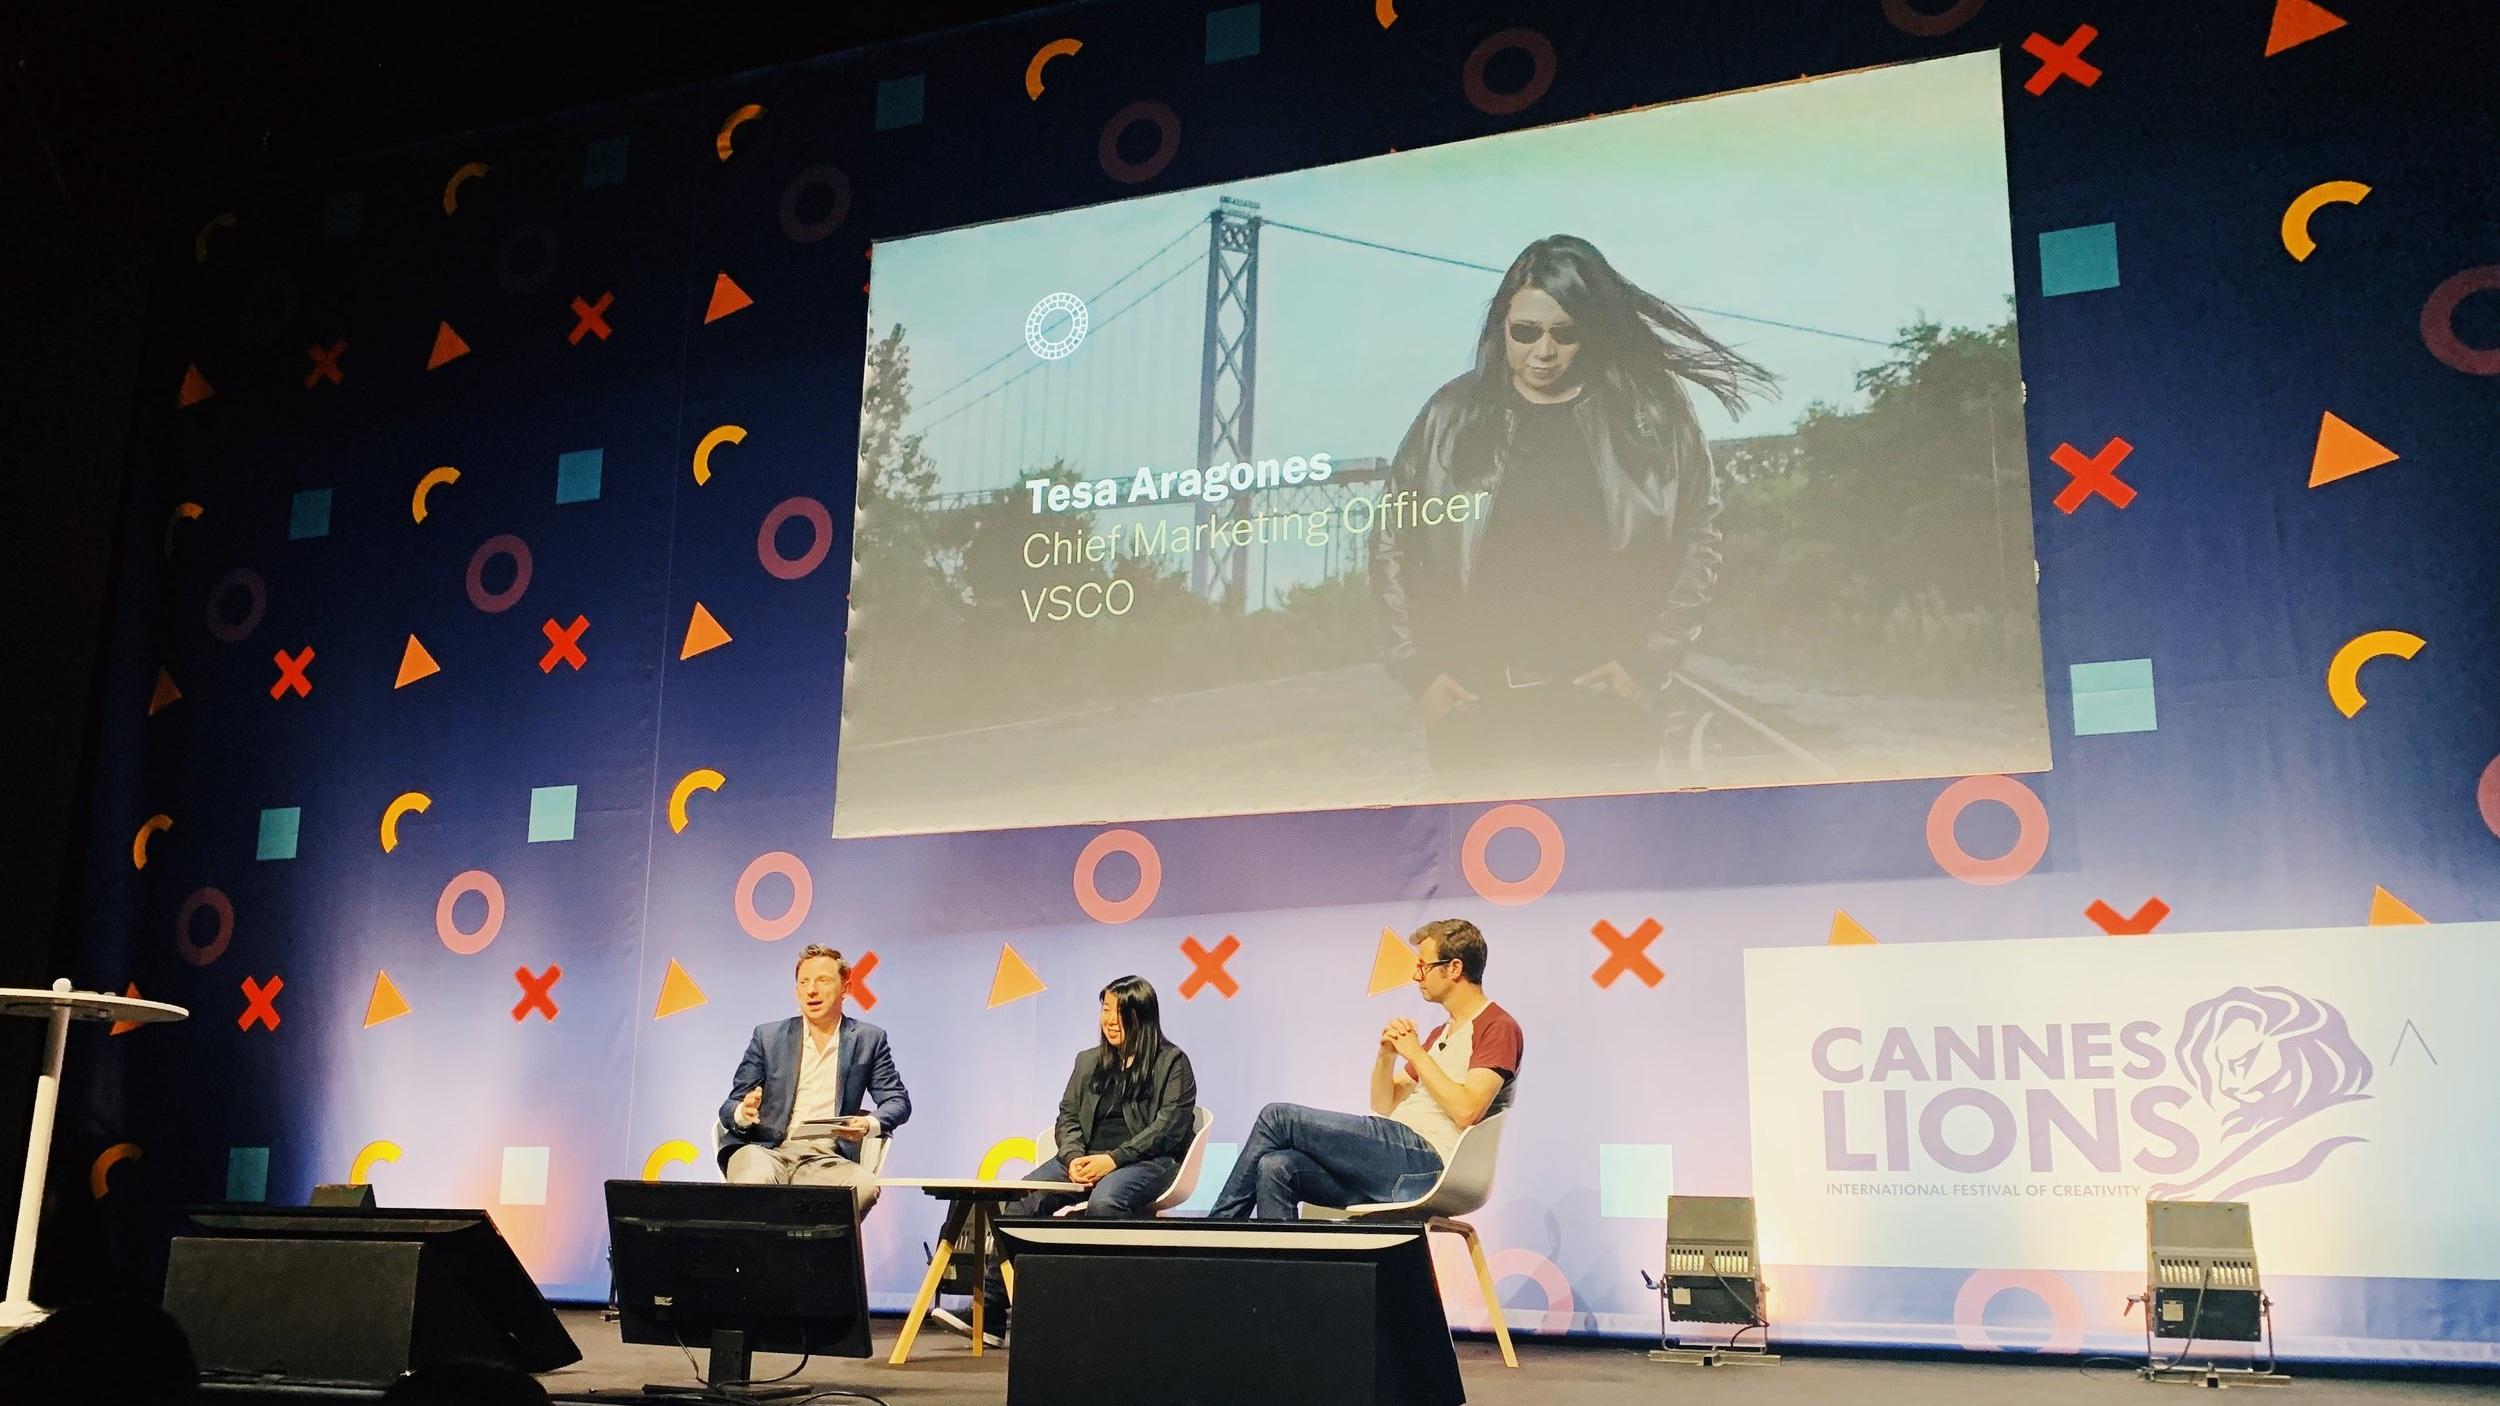 Cannes Lions International Festival of Creativity: Archetype Panel